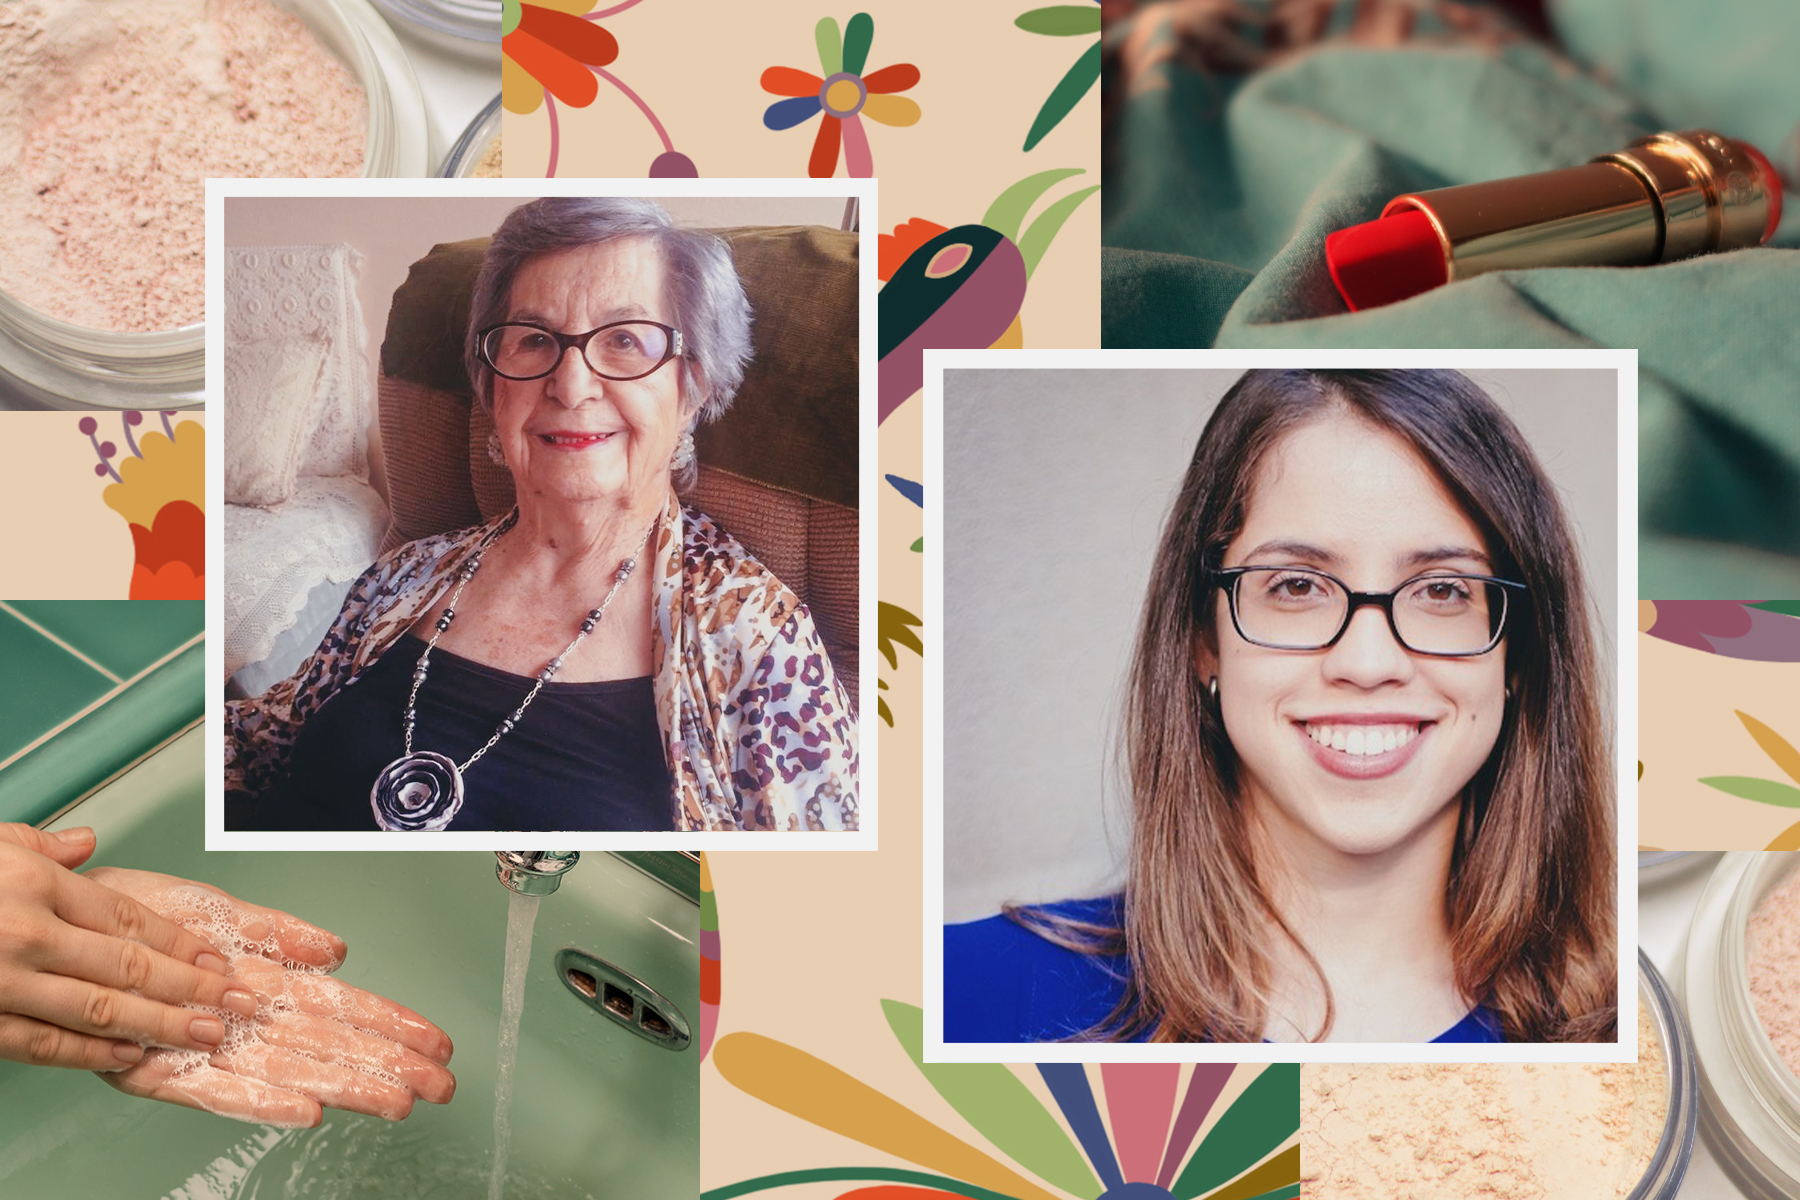 abuela beauty trends, abuela beauty tips